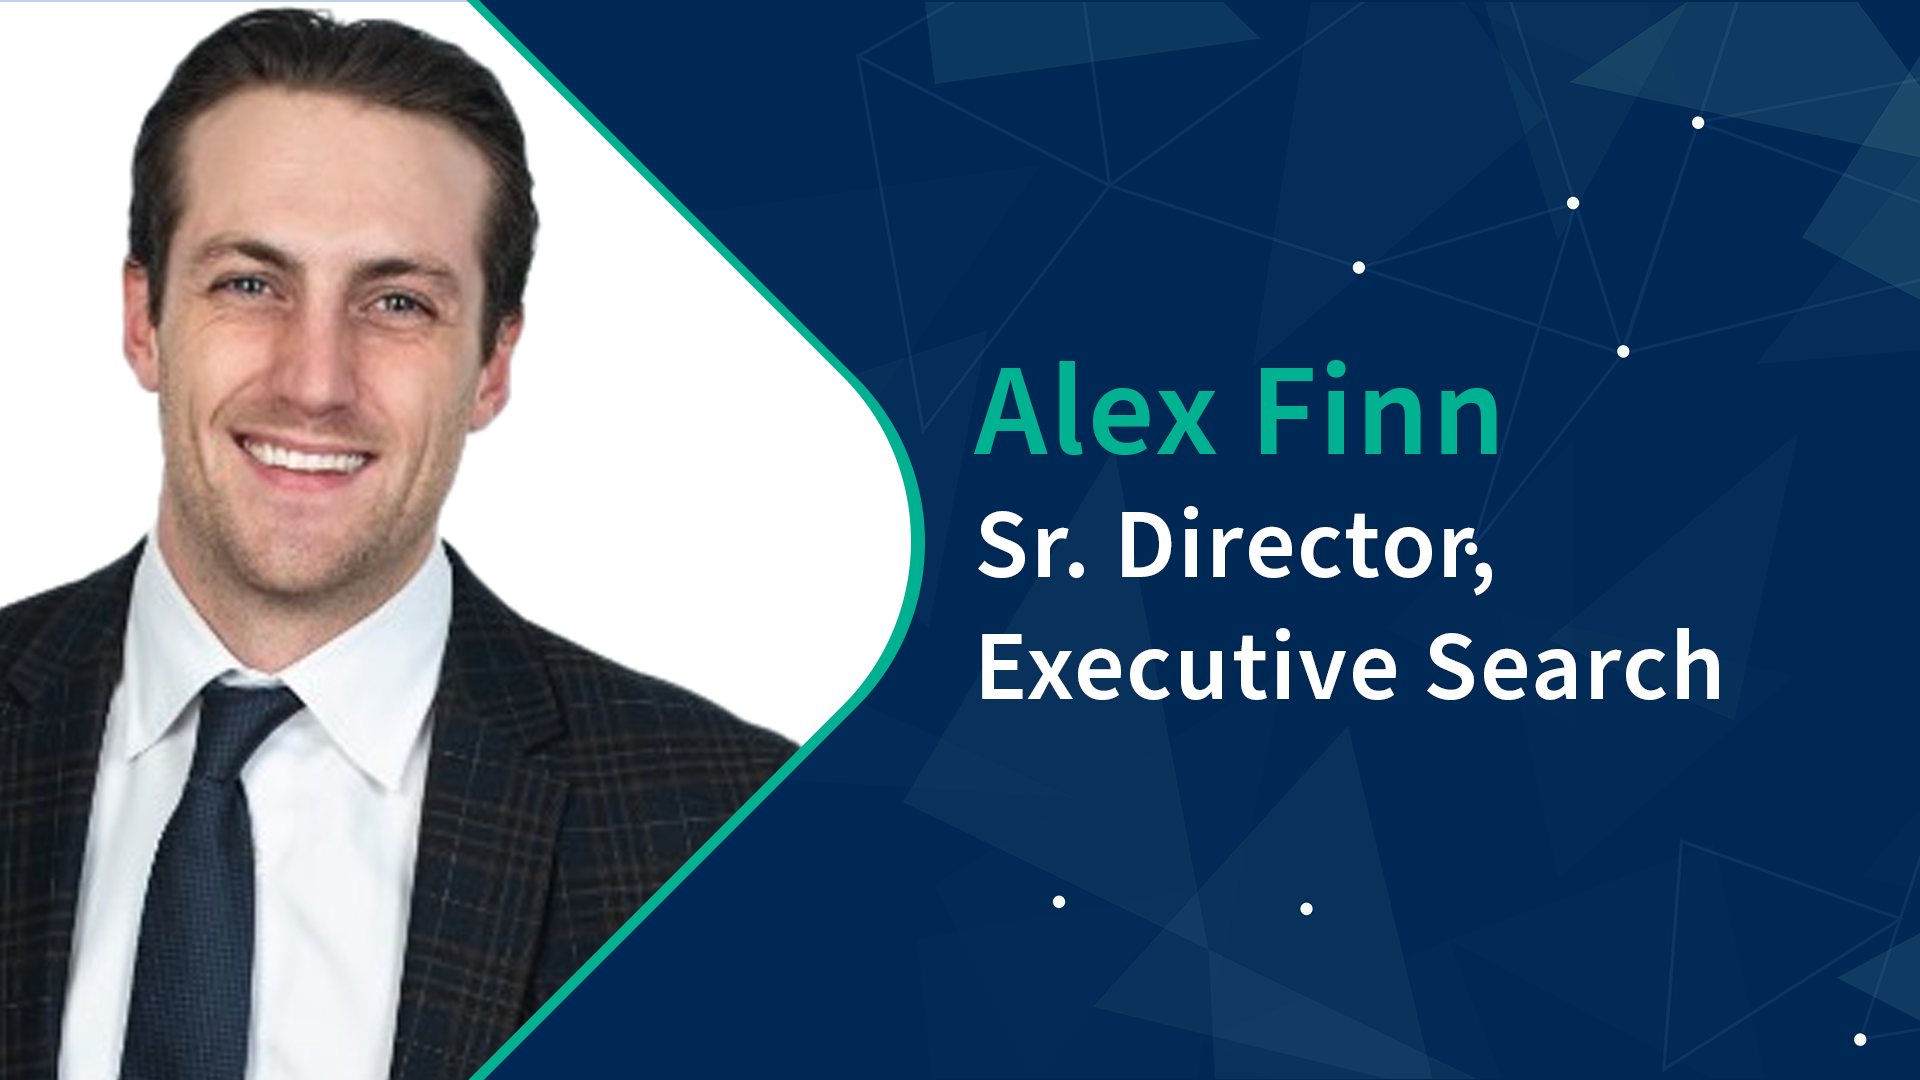 Sr. Director Executive Search Alex Finn